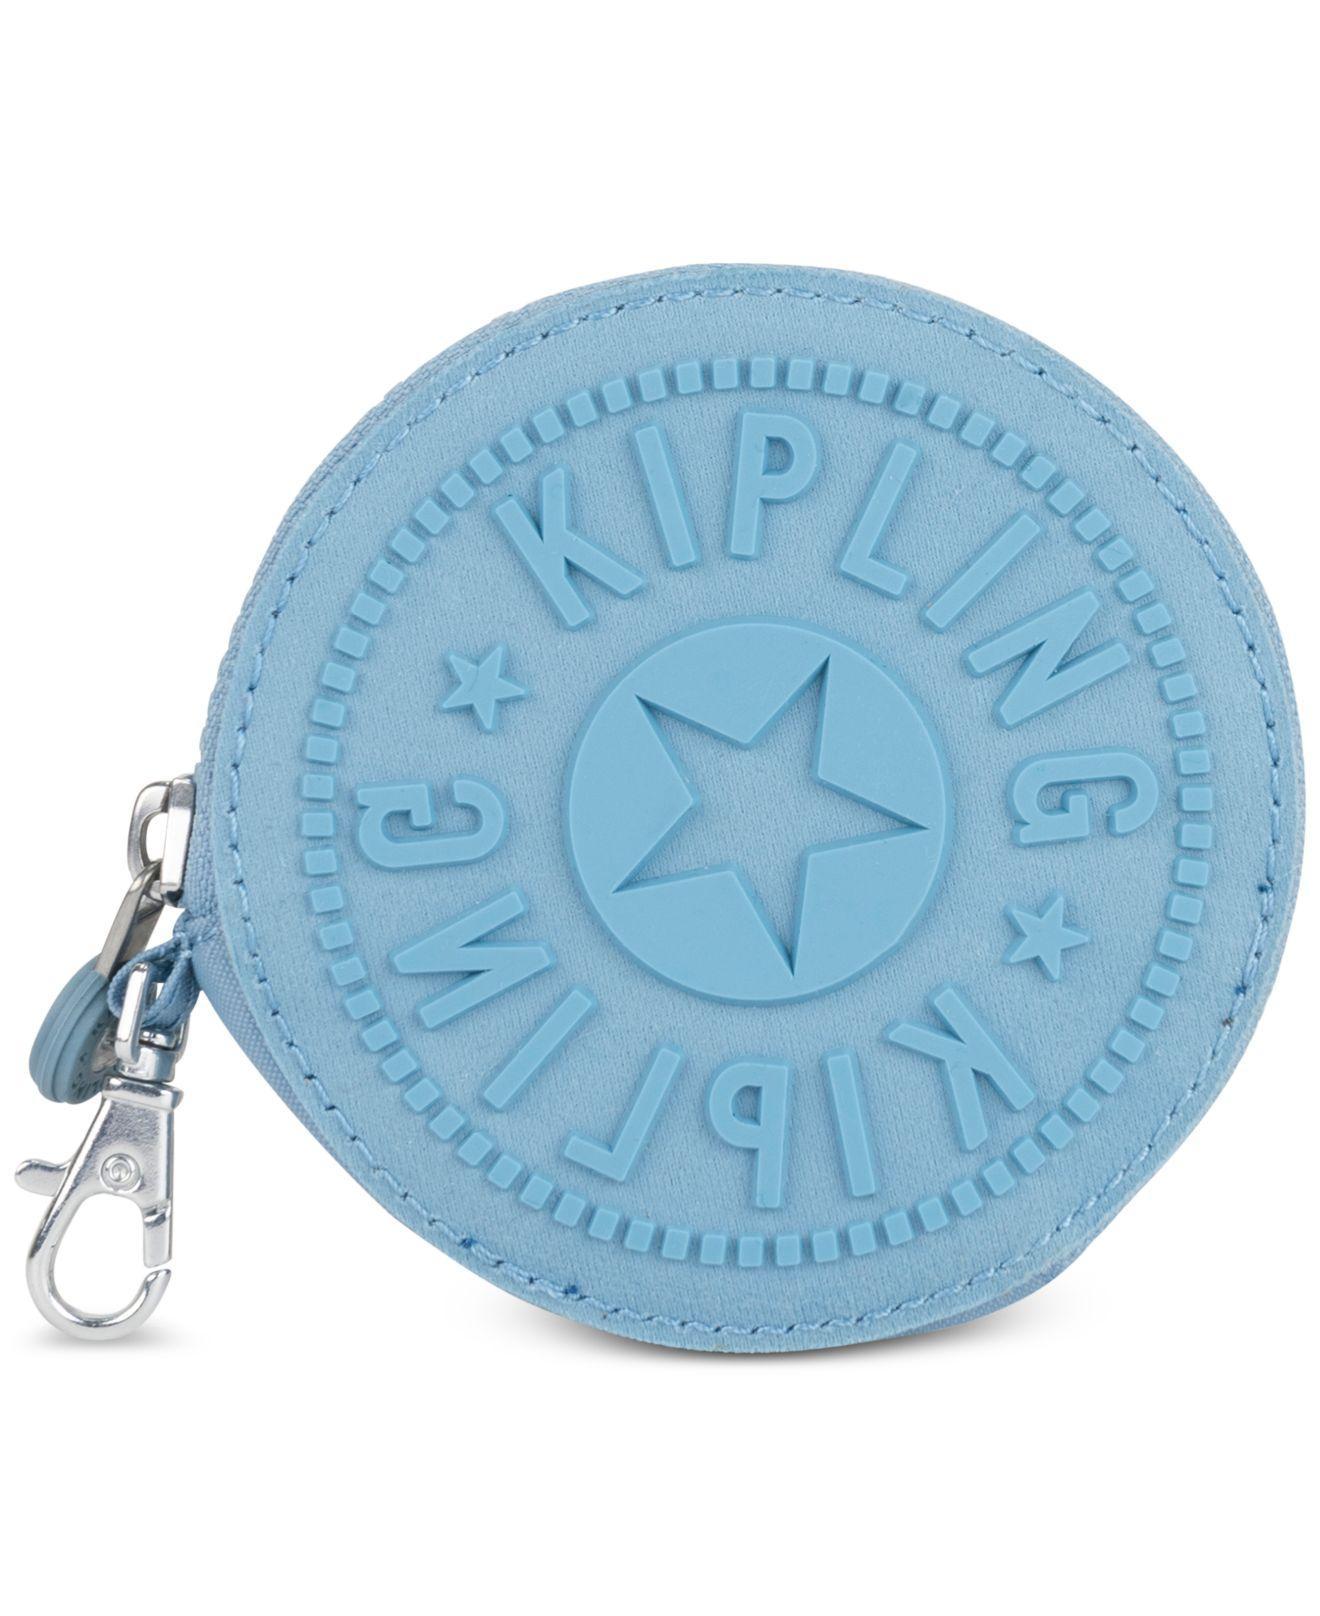 Lyst - Kipling Marguerite Coin Purse in Blue